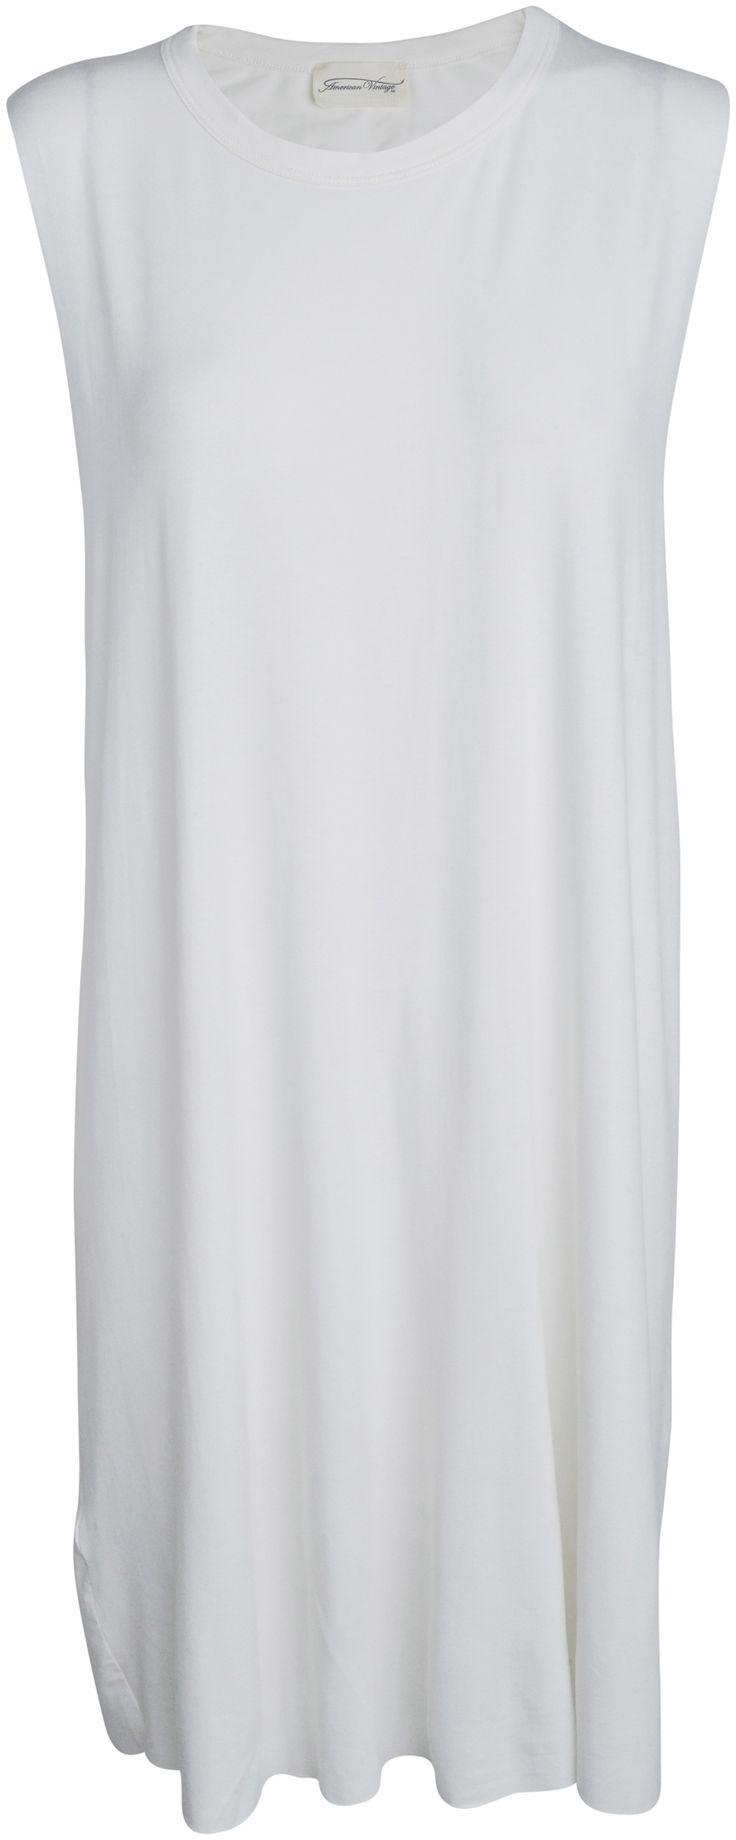 American Vintage - Ærmeløs jersey kjole - YouHeShe